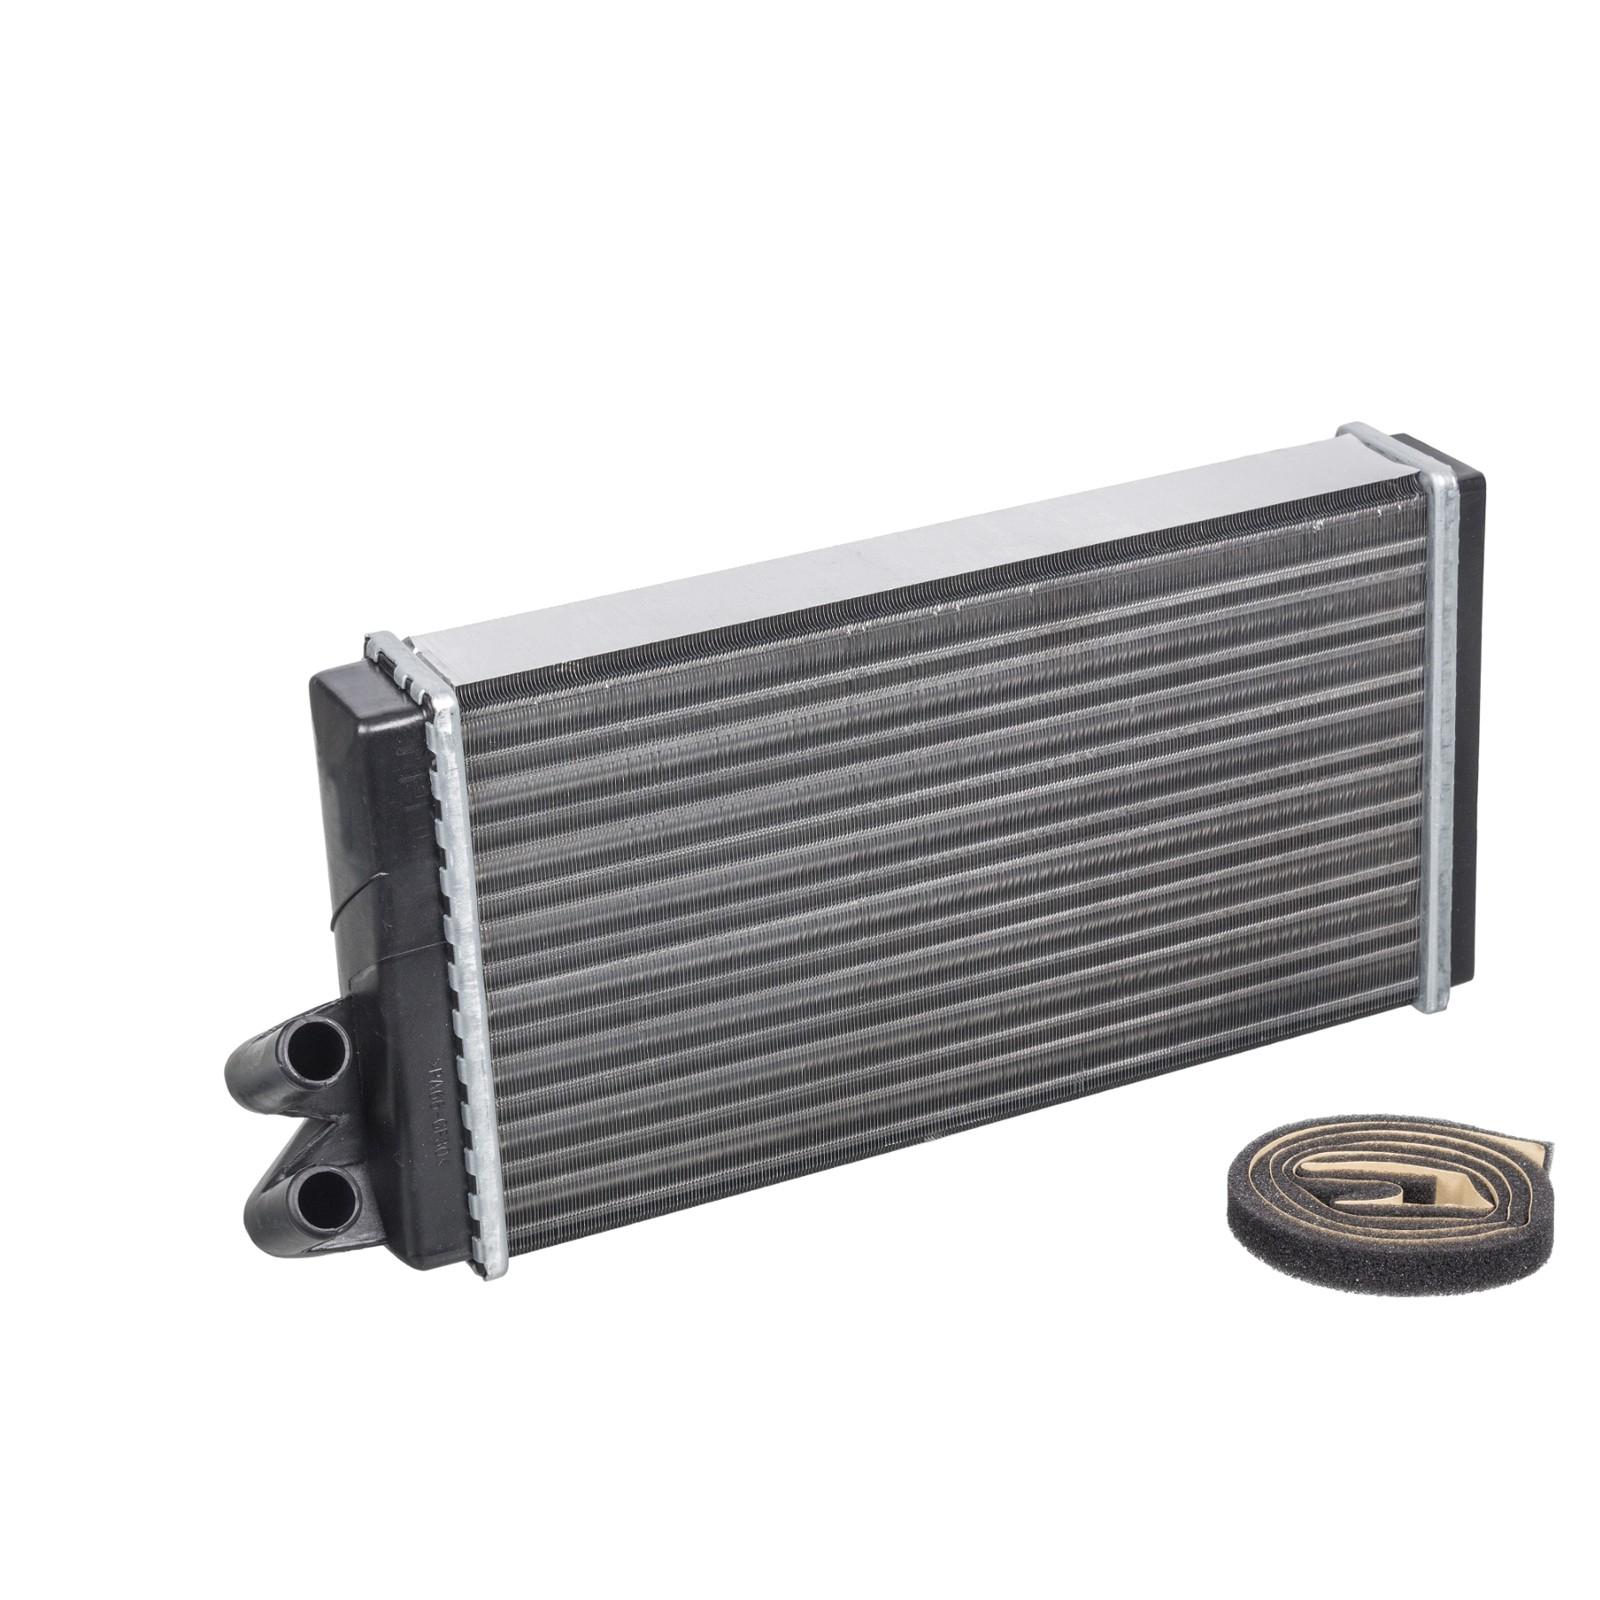 FEBI 11090 Wärmetauscher Innenraumheizung AUDI 100 (C2 C3 C4) 200 A6 (C4) V8